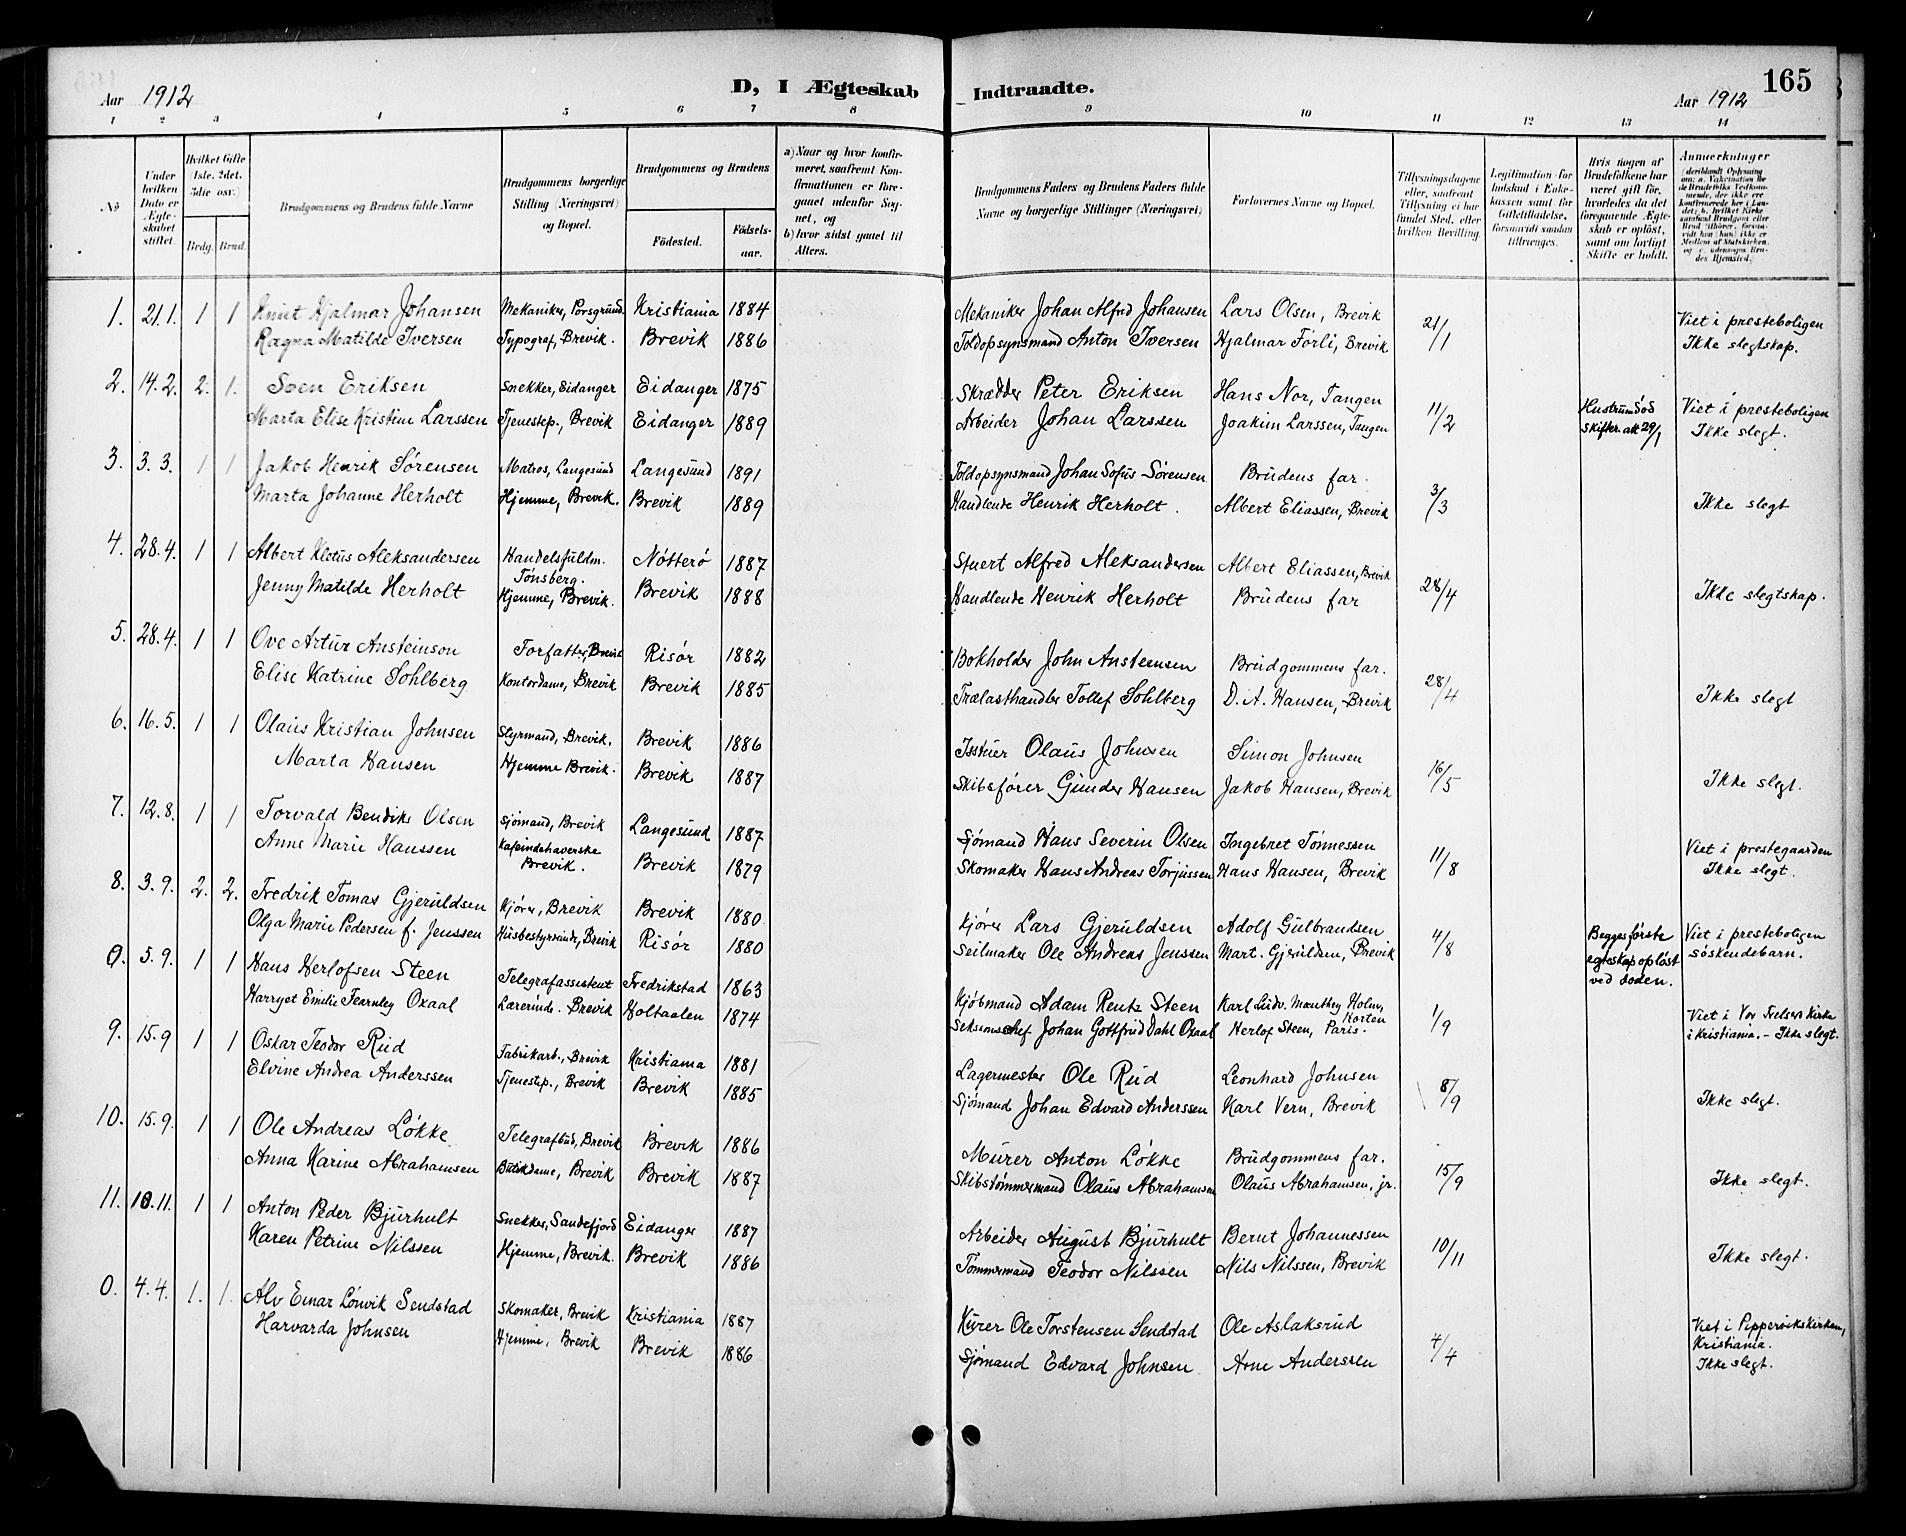 SAKO, Brevik kirkebøker, G/Ga/L0005: Klokkerbok nr. 5, 1901-1924, s. 165